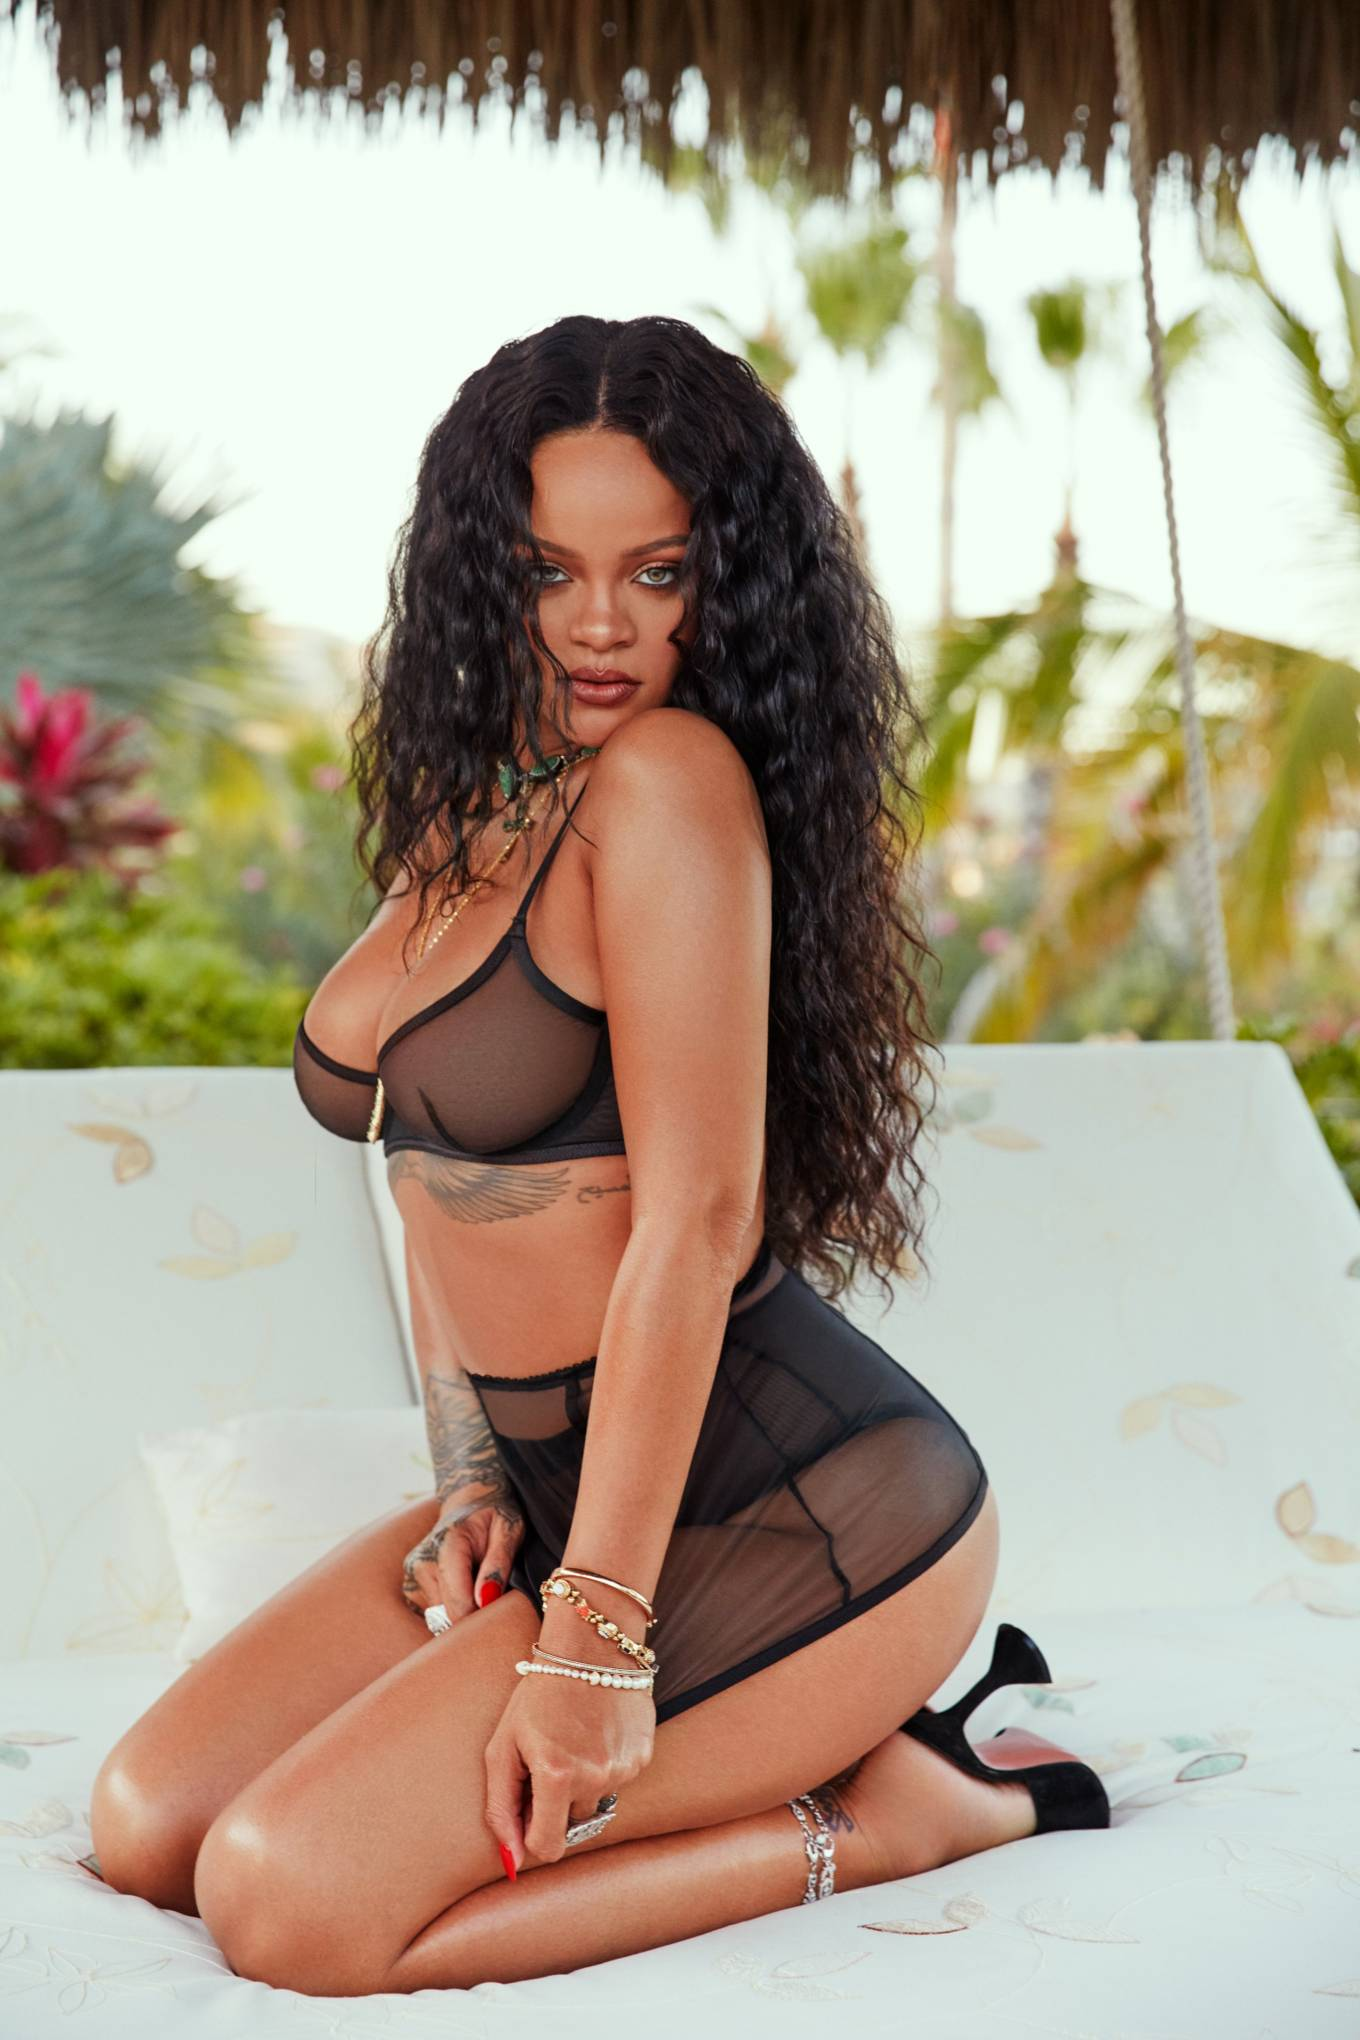 Rihanna - Savage x Fenty Collection (April 2020)